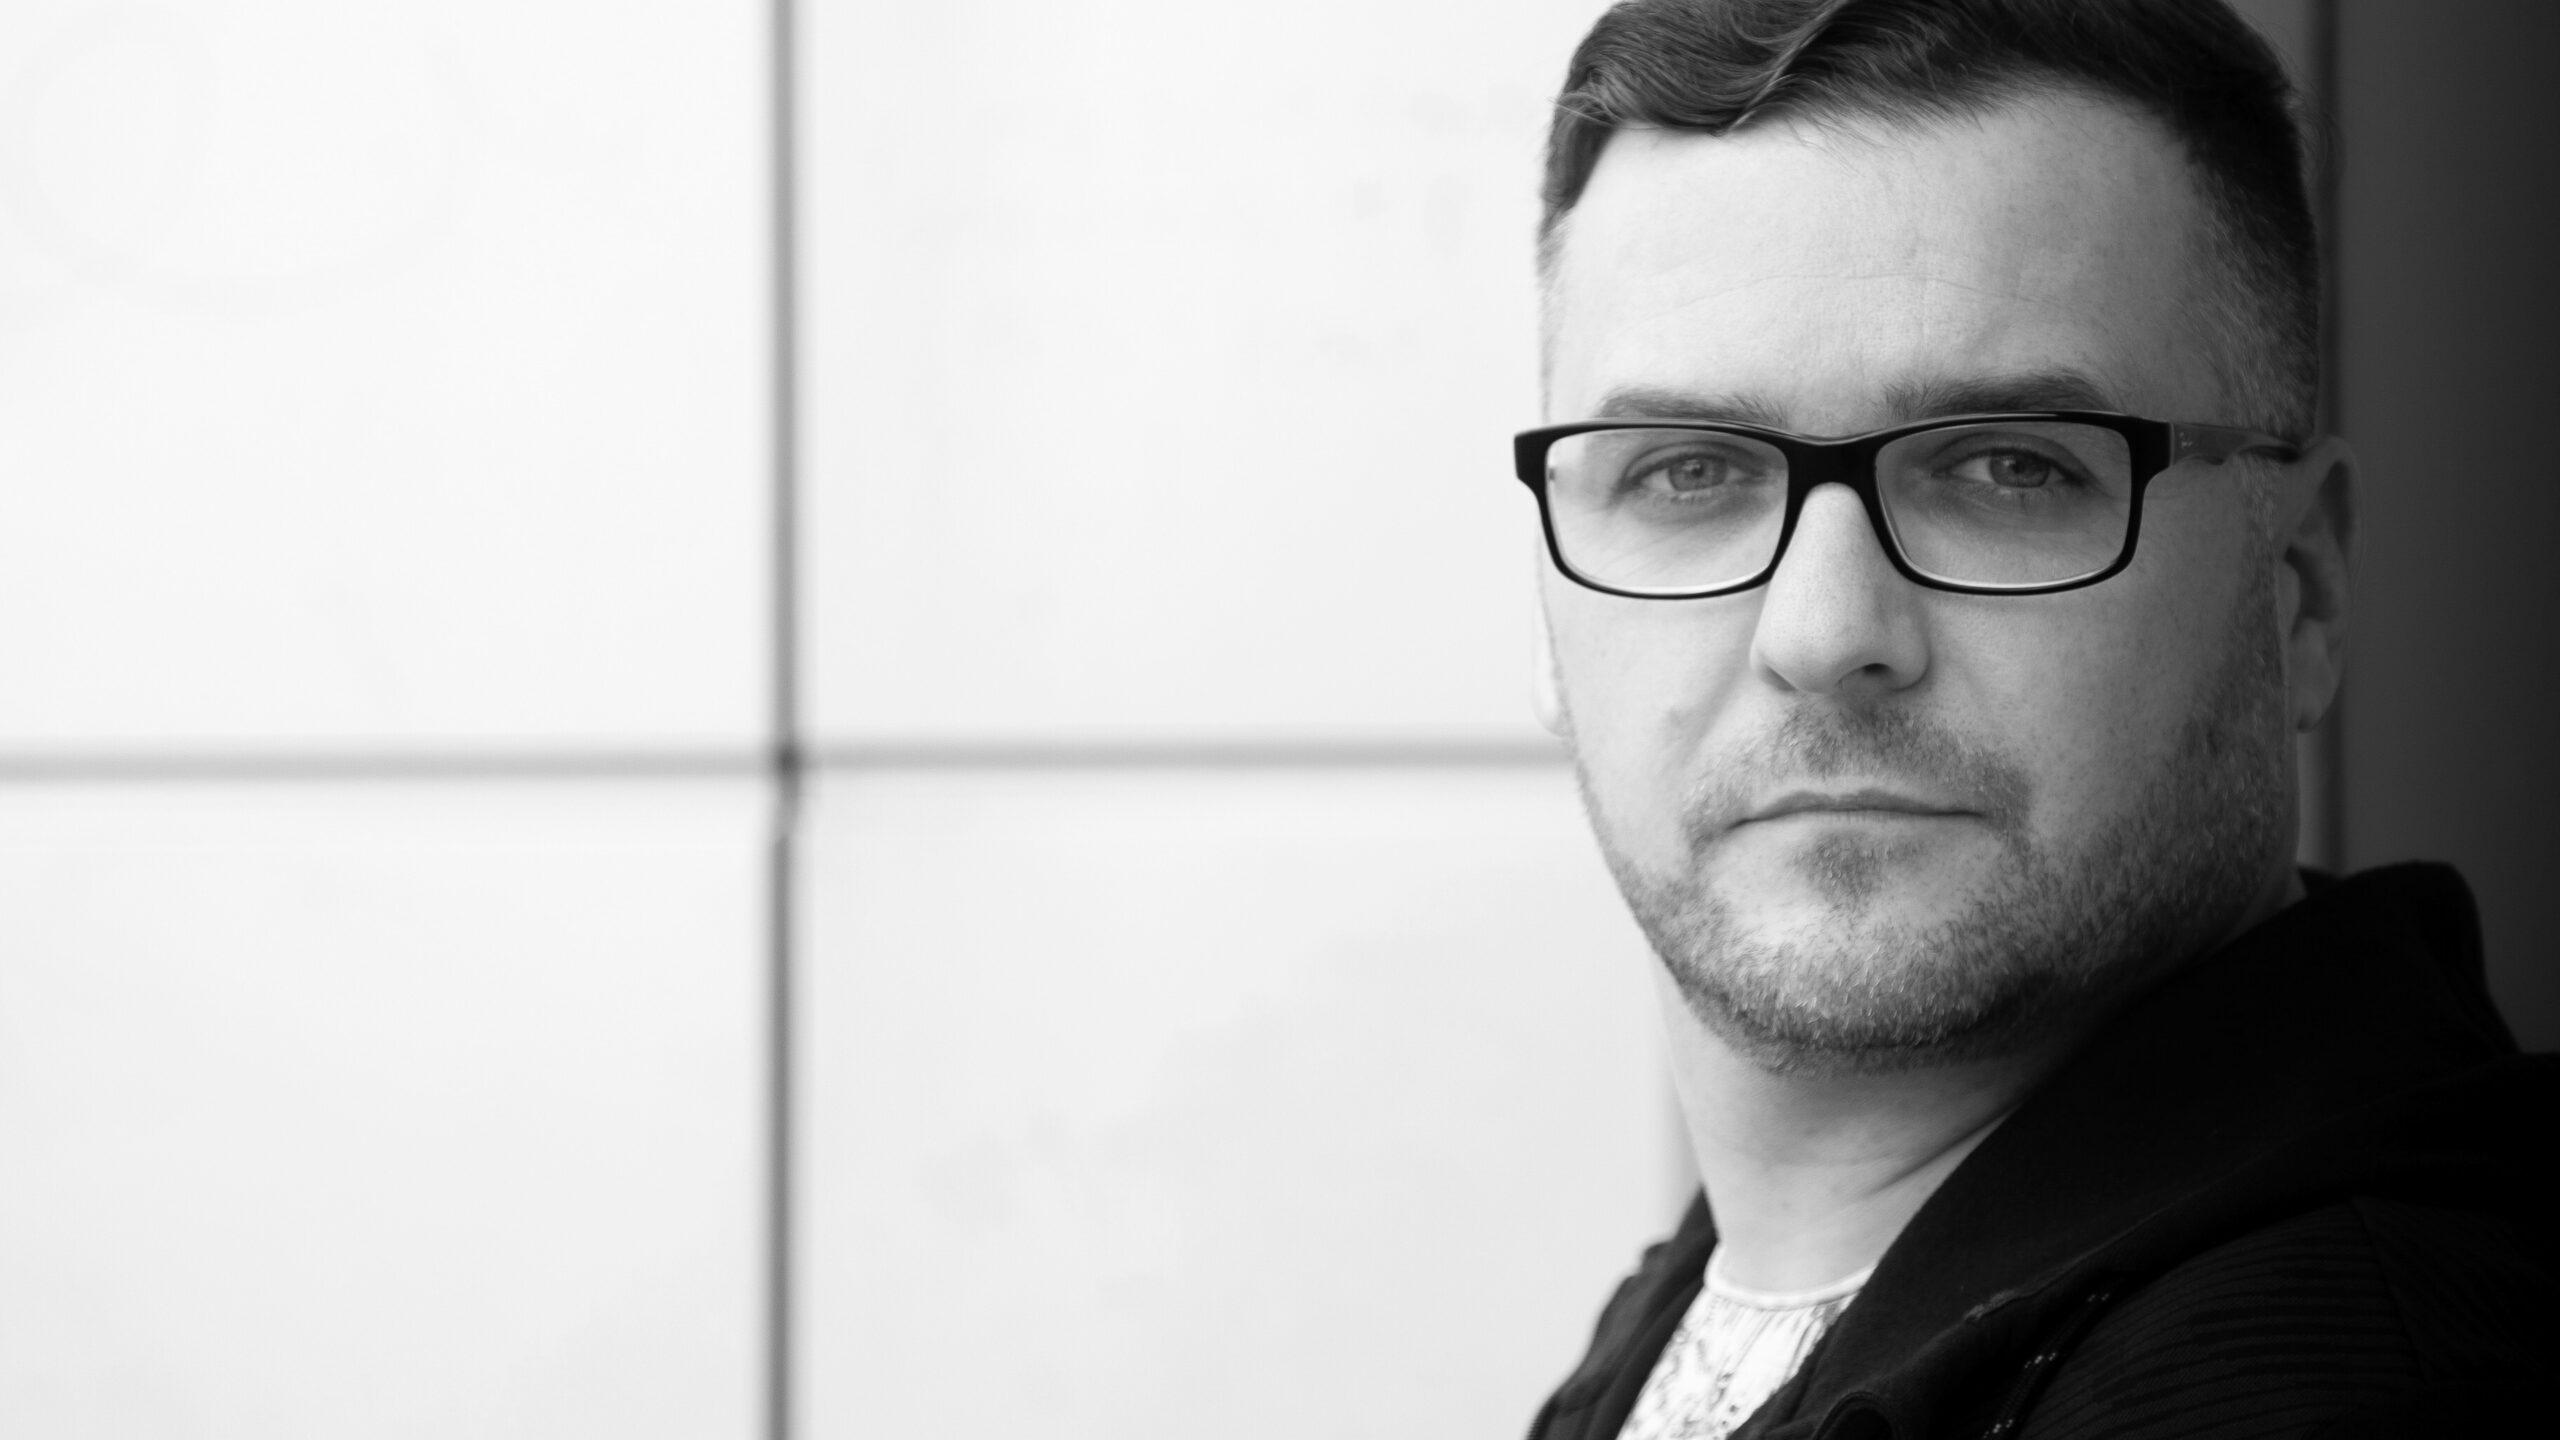 Subcast 09 - Krunoslav Nerad - COGNITION